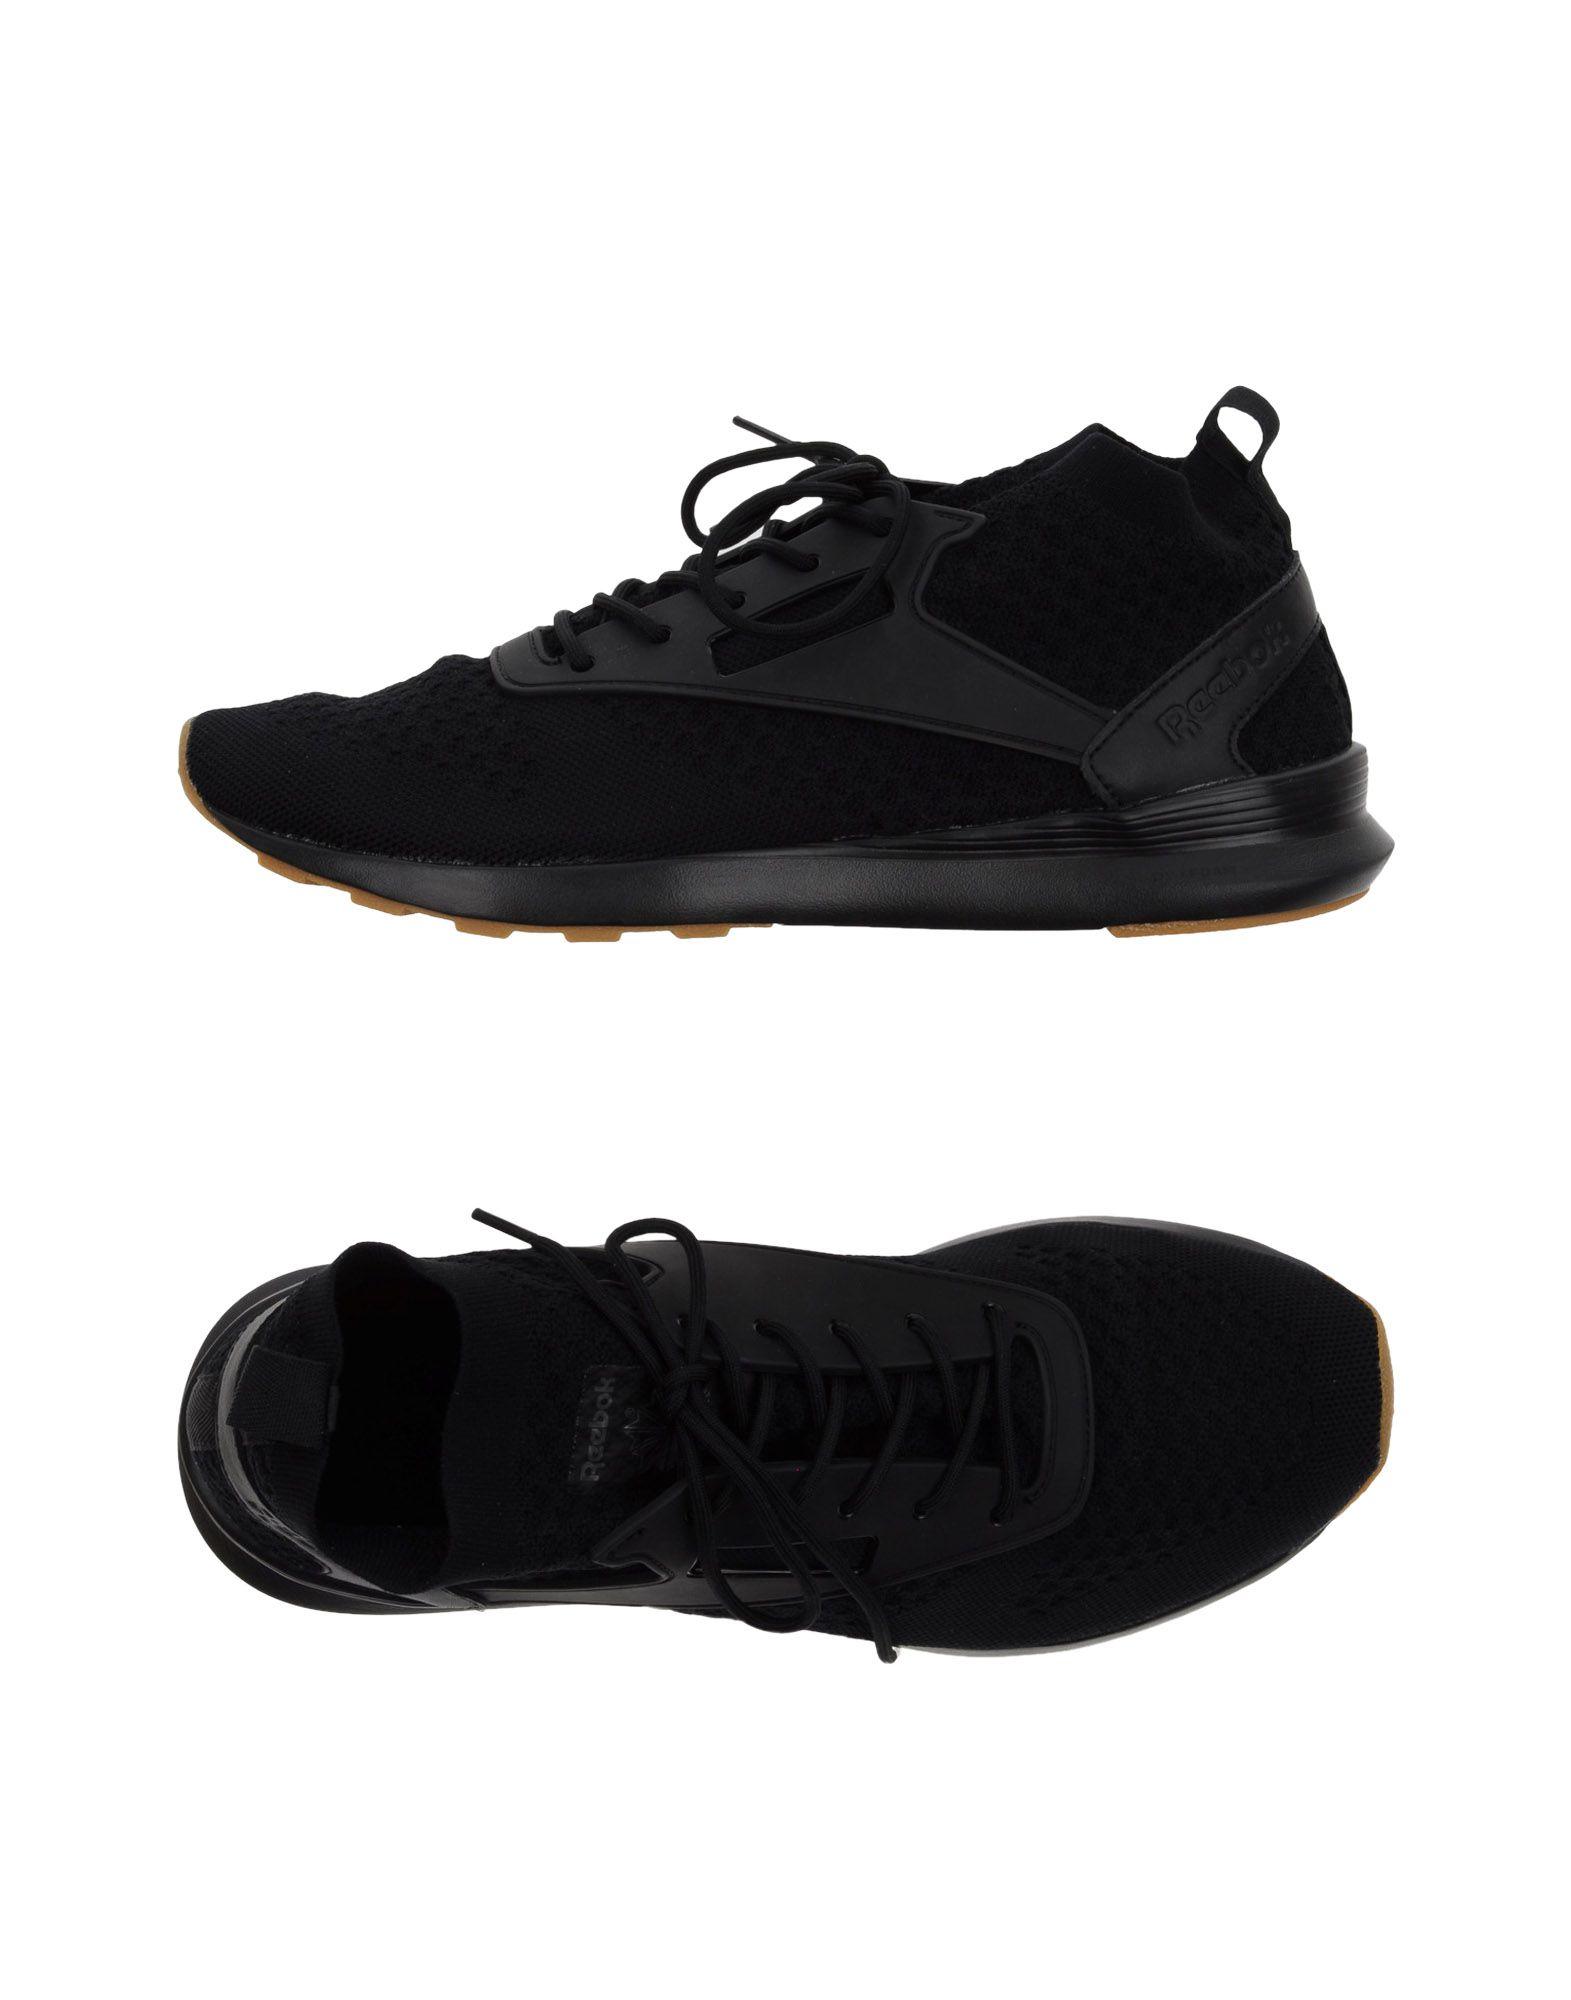 Rabatt echte Schuhe Reebok Turnschuhes 11360587VP Herren 11360587VP Turnschuhes e71206